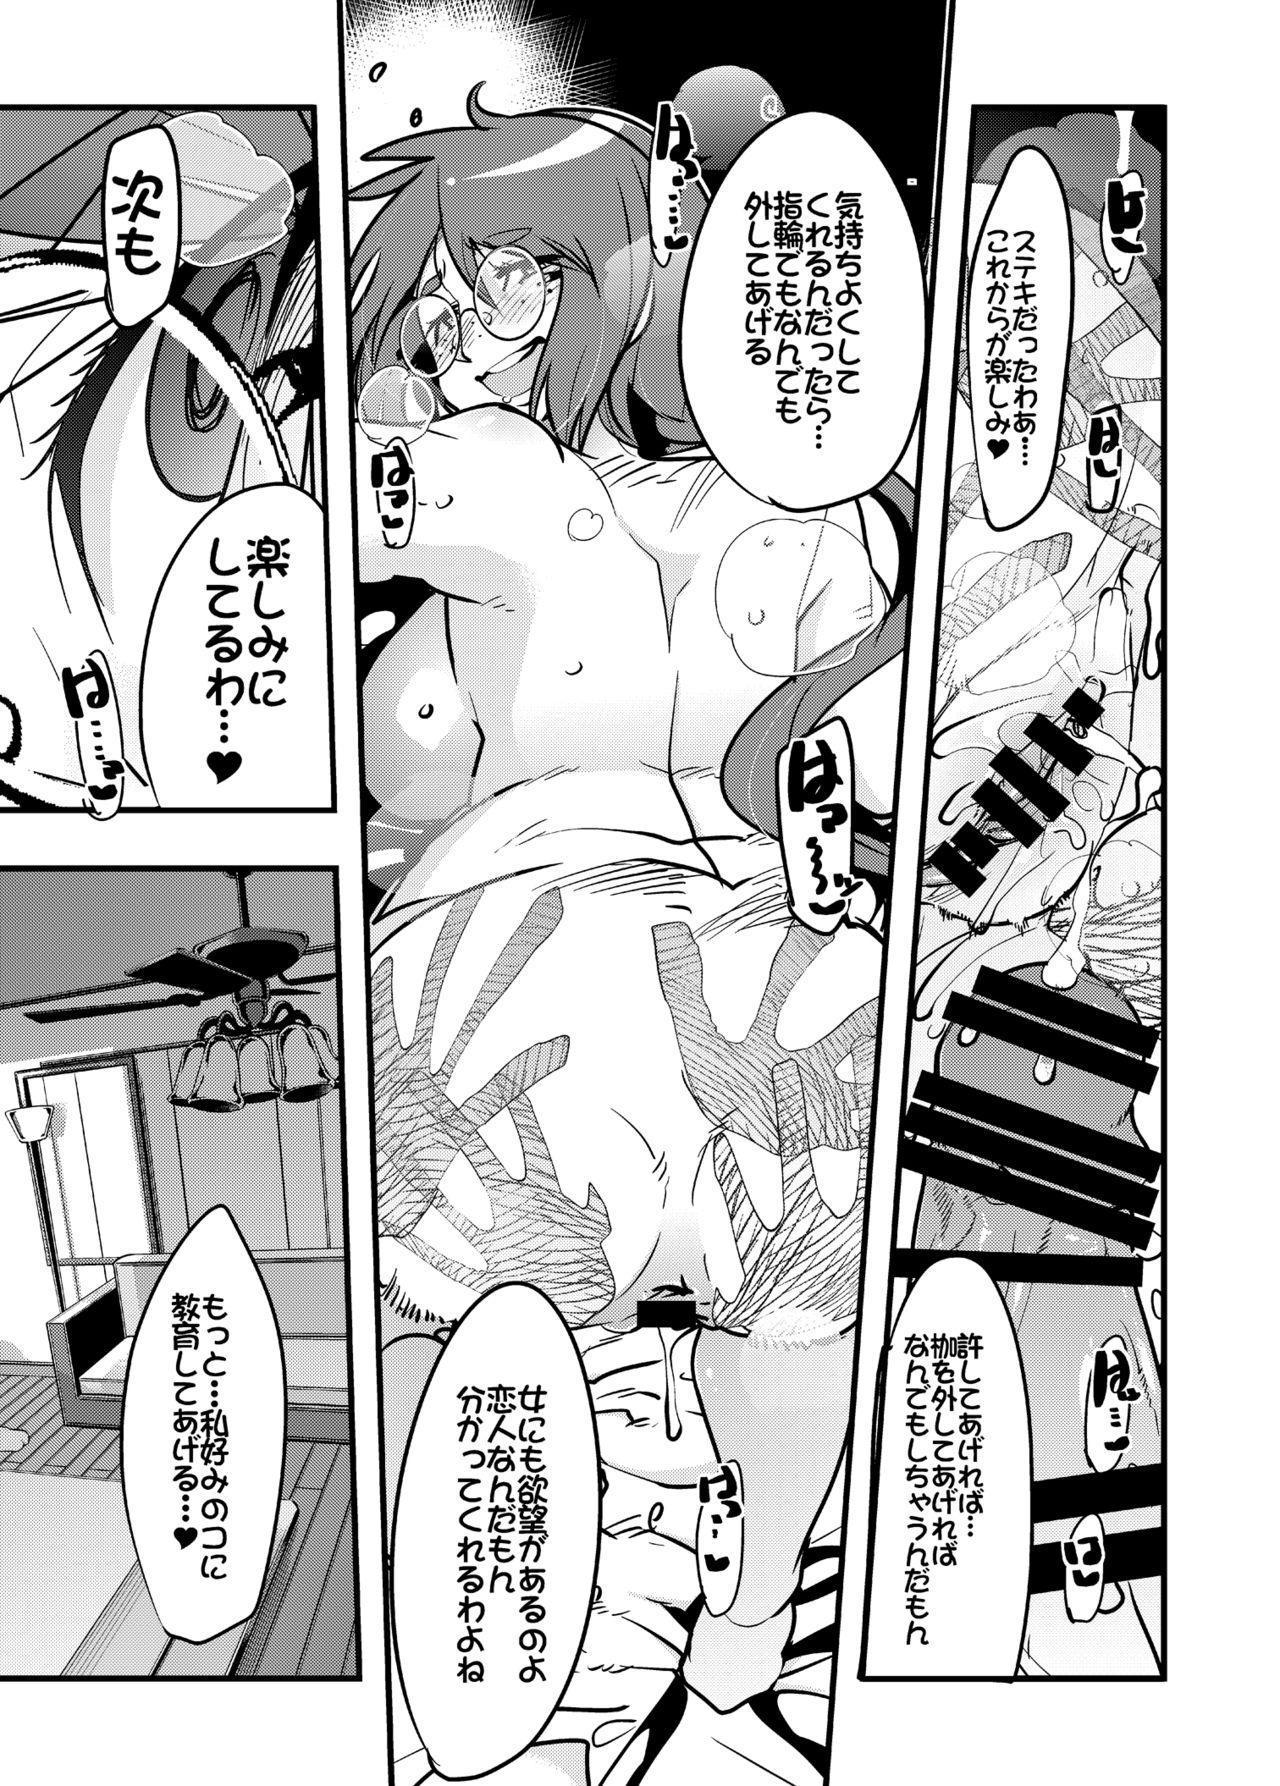 Weekly SeFri Oba-san 24